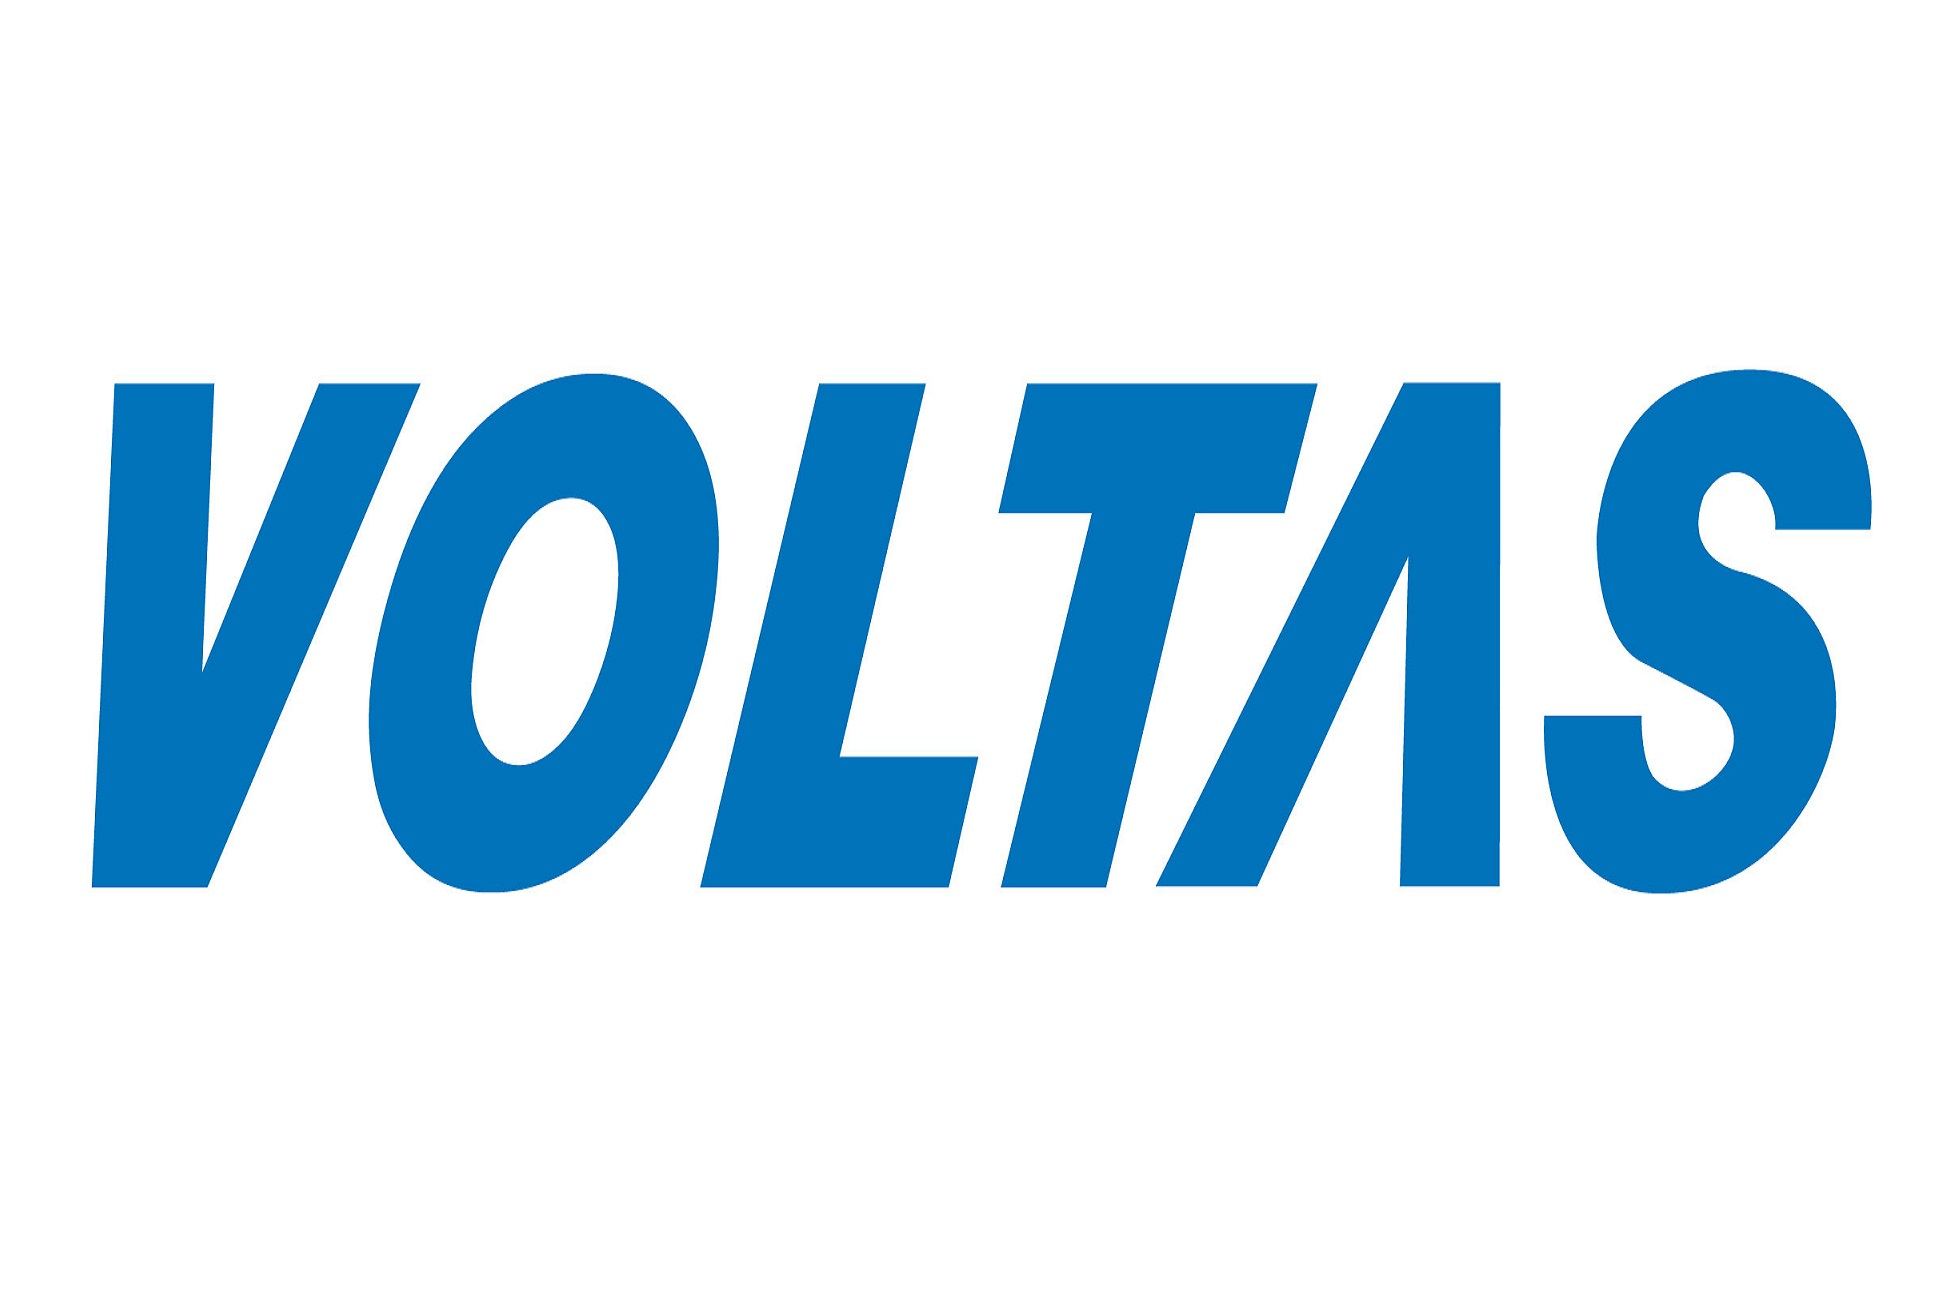 Voltas 183Pya-R/183Pyt-R 1.5 Ton 3 Star Split AC Image